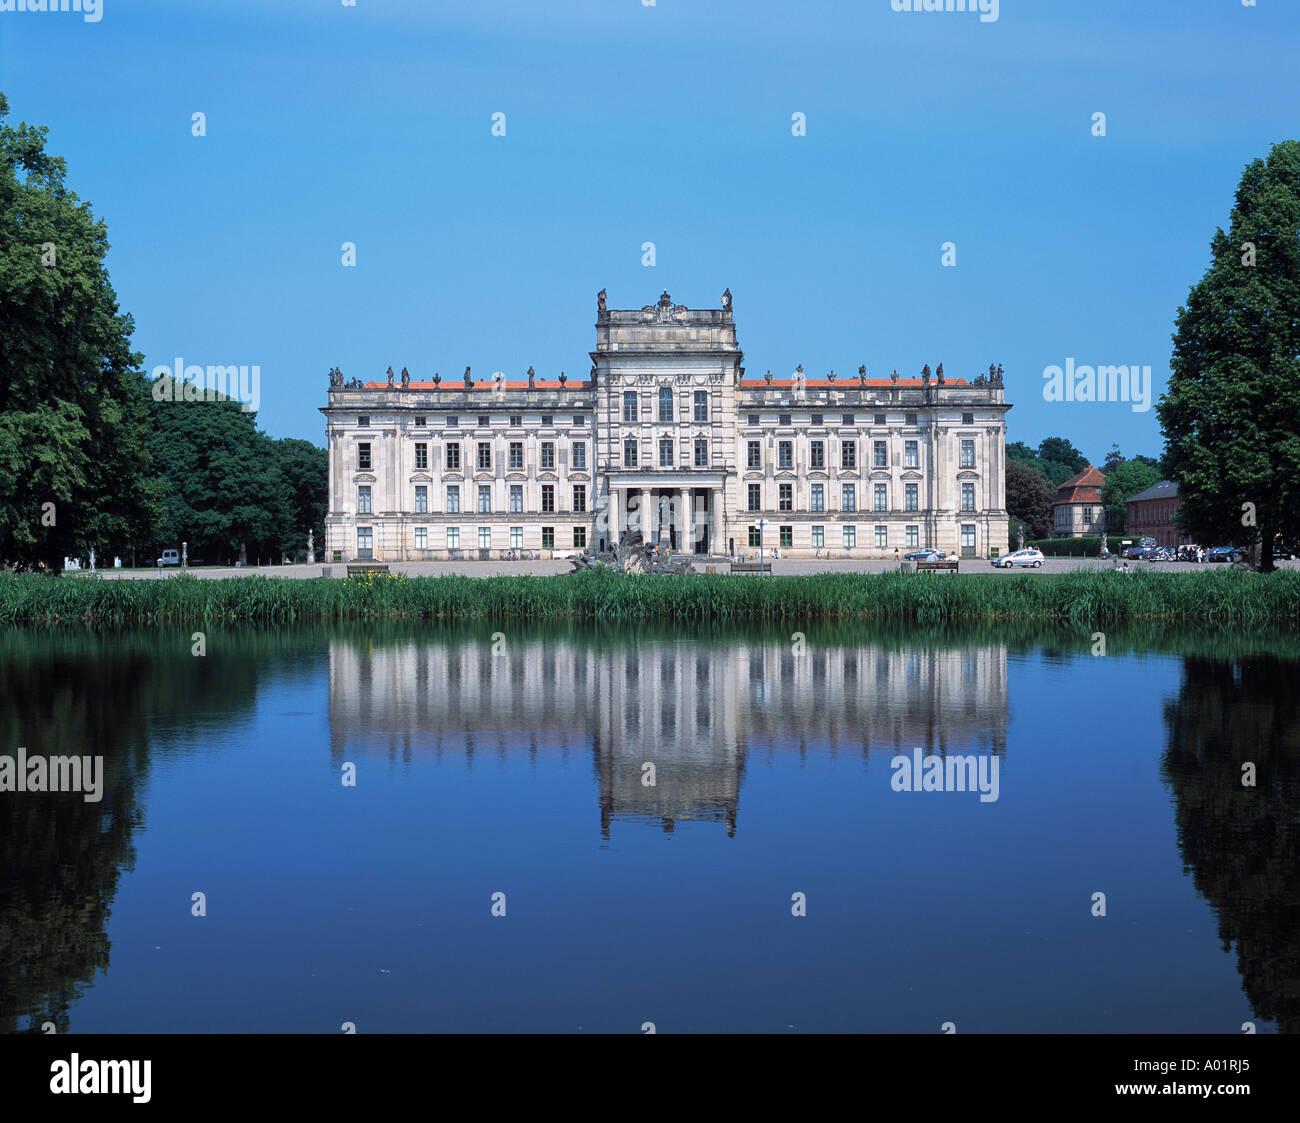 Barockschloss, Residenzschloss, Schlossplatz, Schlossteich Am Basin, Ludwigslust, Griese Gegend, Mecklenburg-Vorpommern Stock Photo